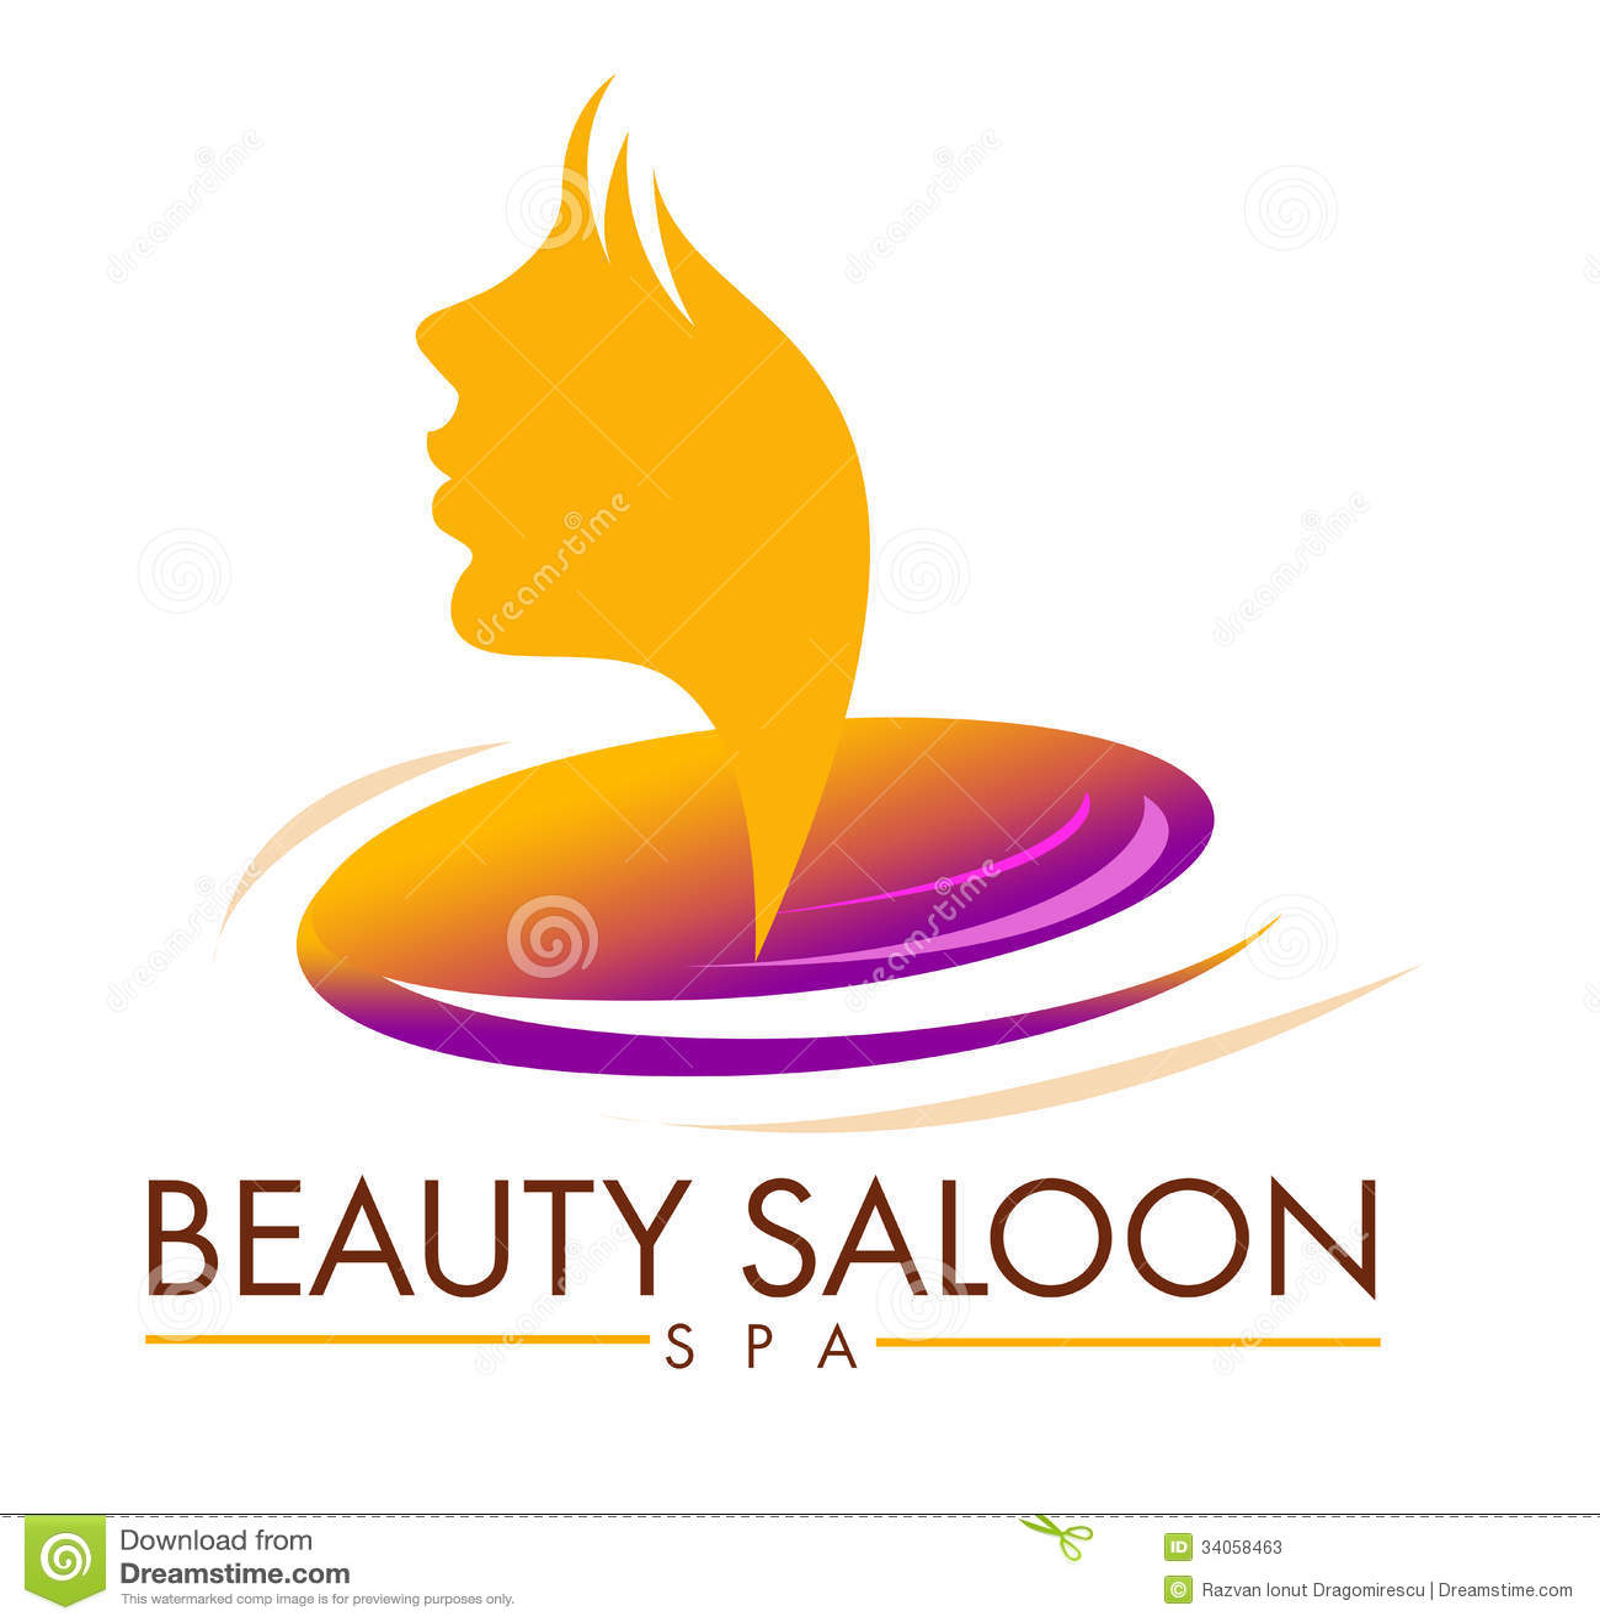 Galerry design ideas for hair salon